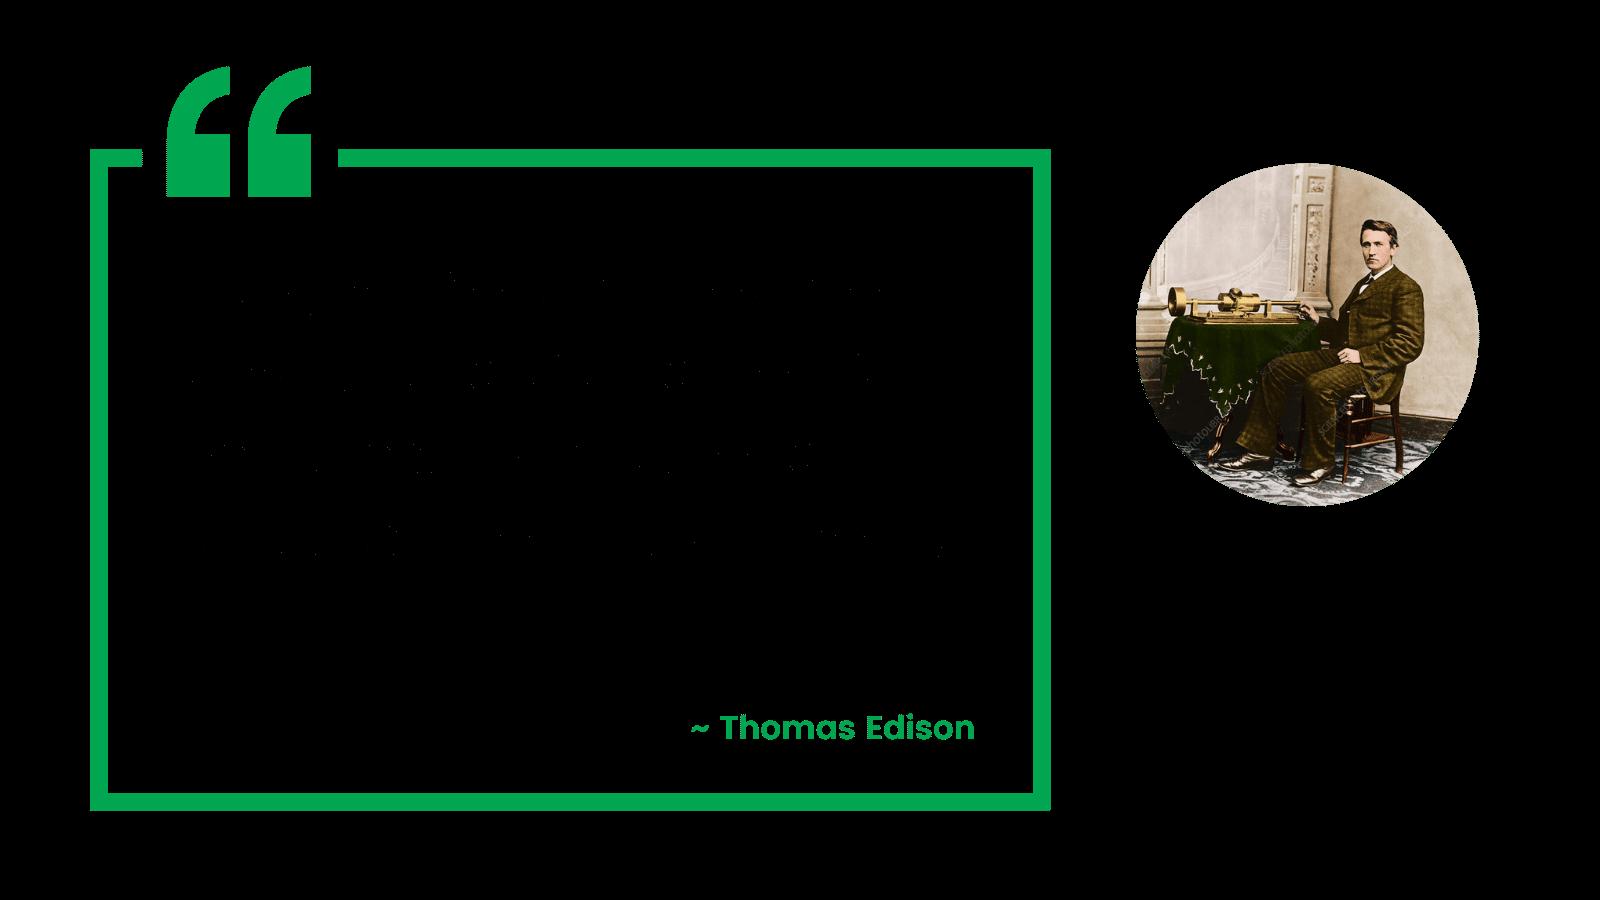 inspirational-thomas-edison-quote